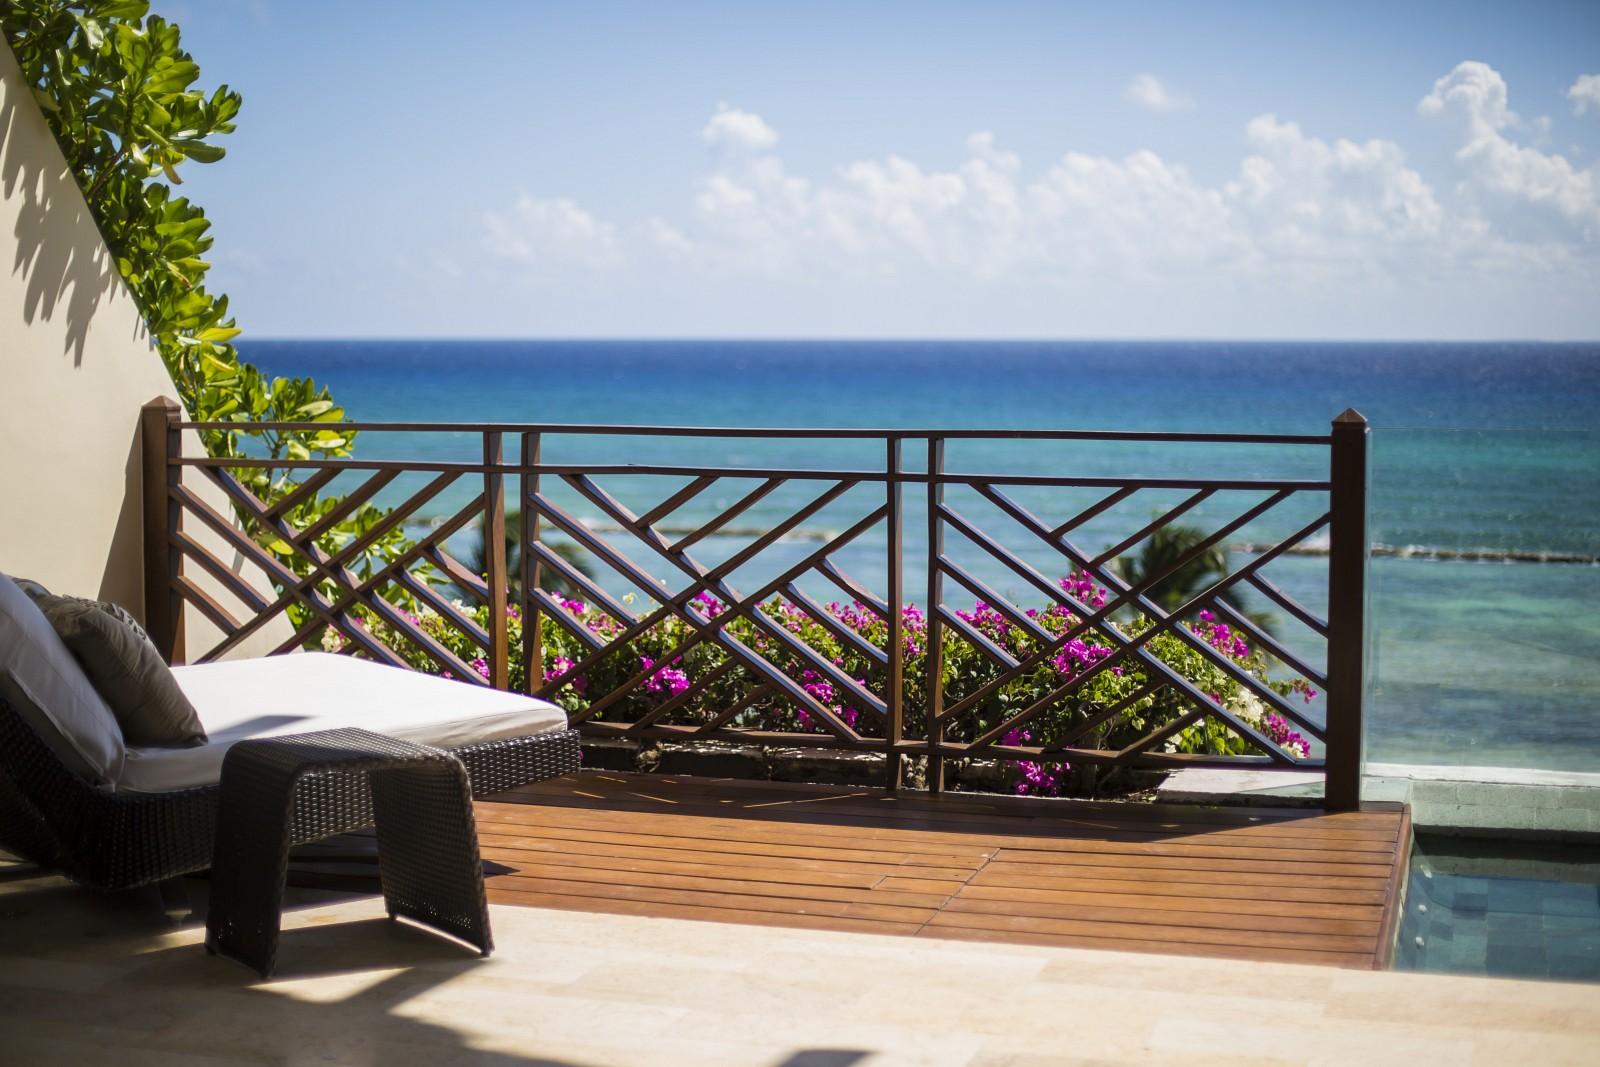 Travel Agency All-Inclusive Resort Grand Velas Riviera Maya 036